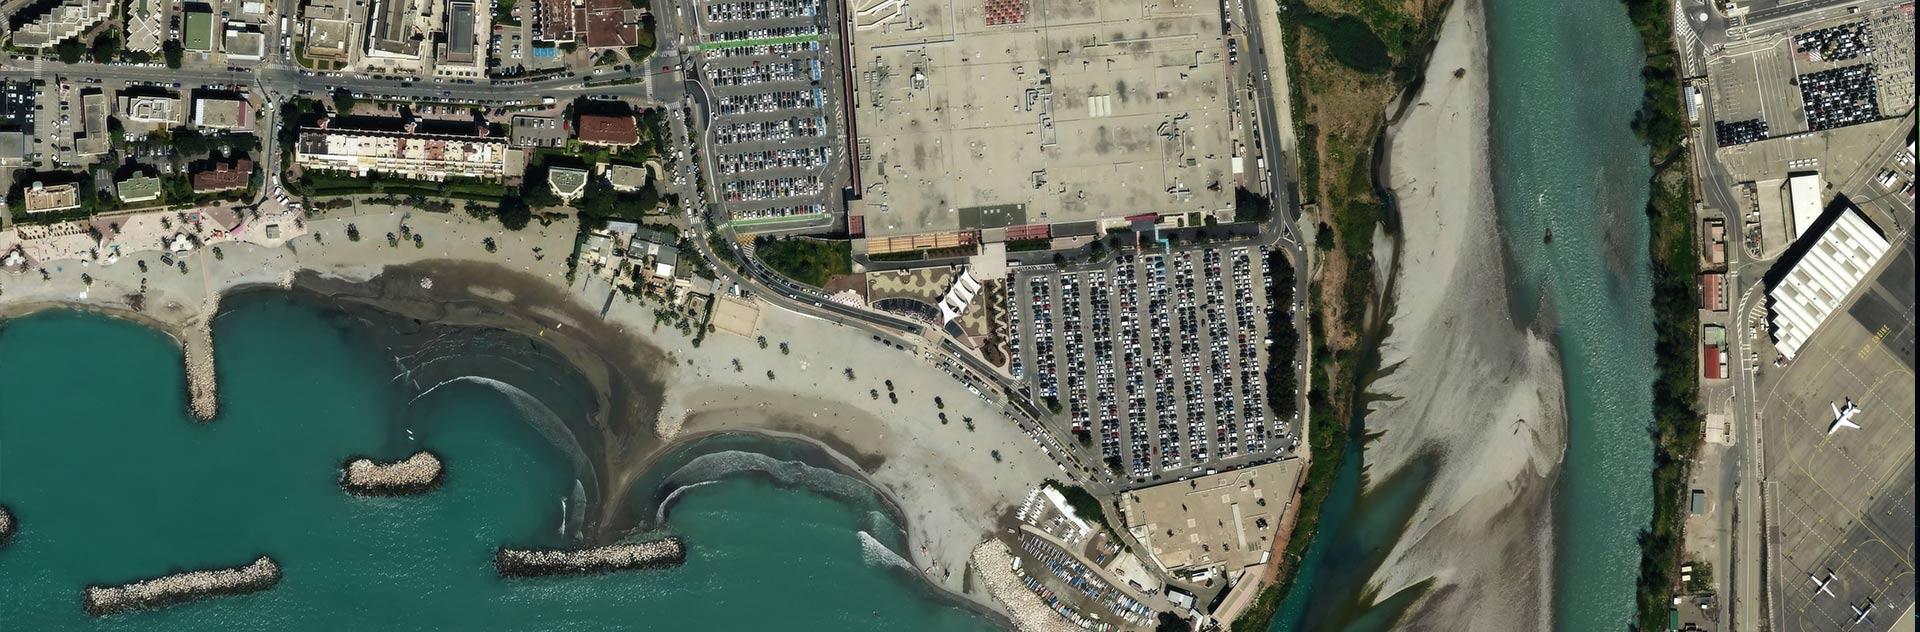 Pléiades Neo 30cm resolution satellite image of Nice, France